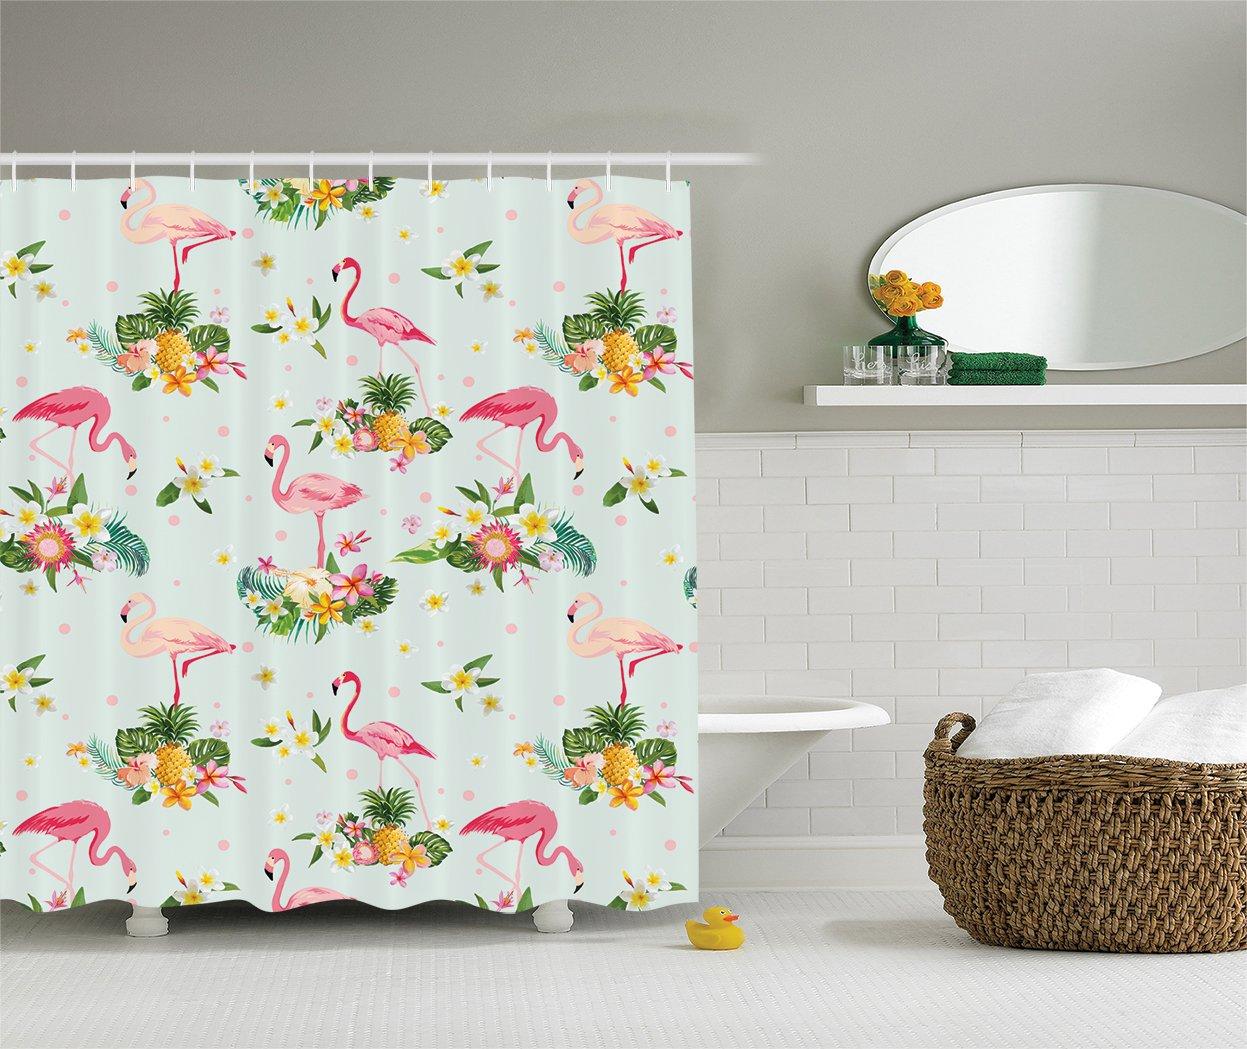 Amazon.com: Ambesonne Flamingo Decor Collection, Flamingo Bird and ...